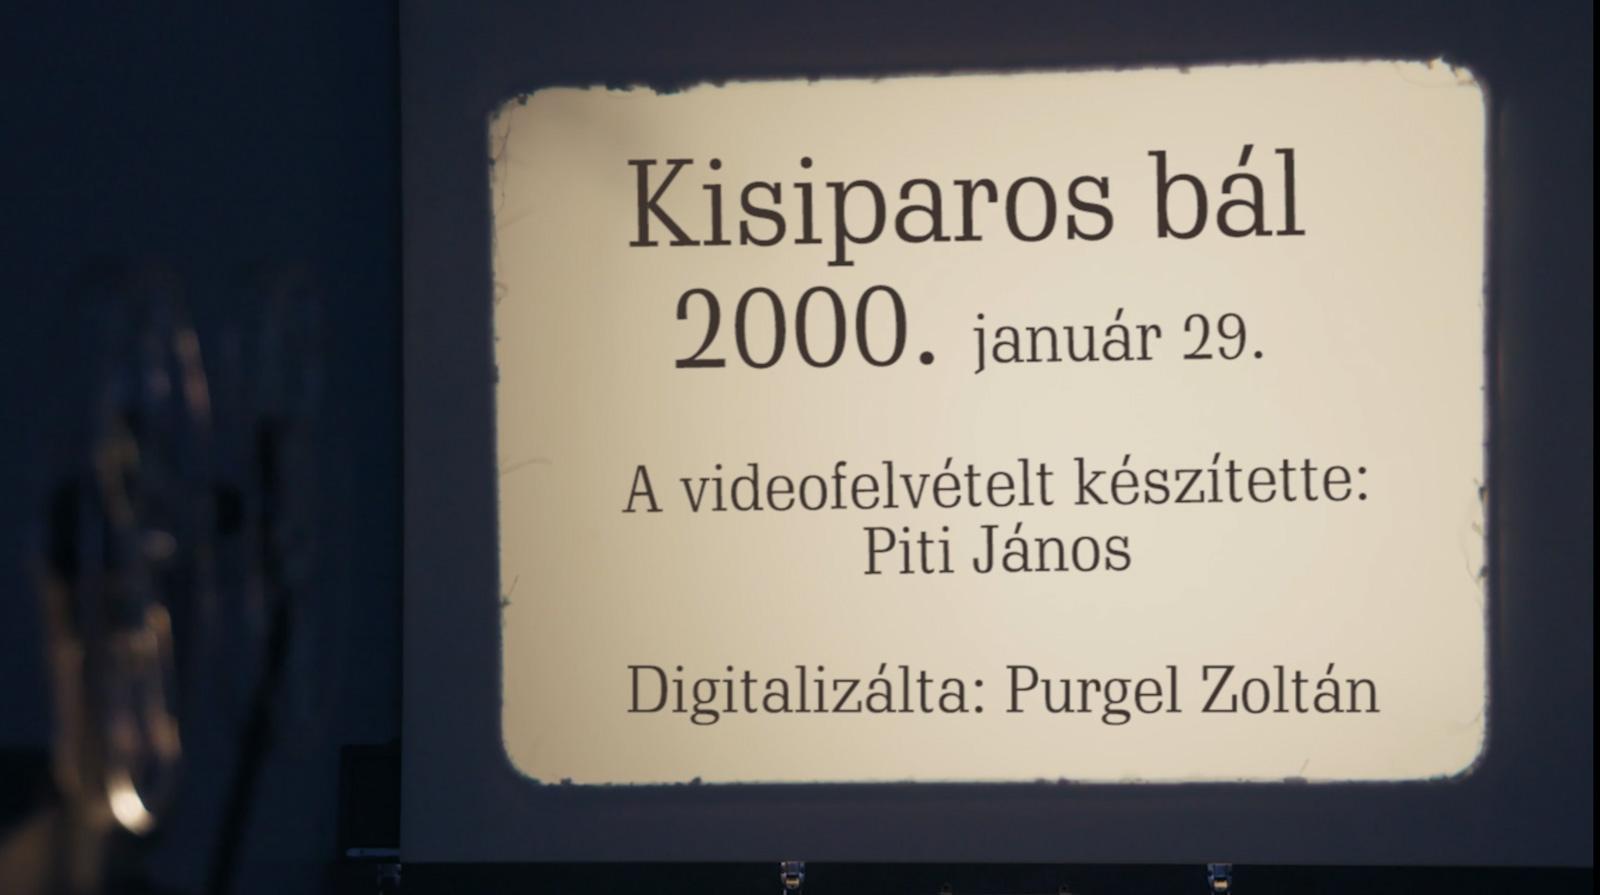 Kisiparos bál 2000.